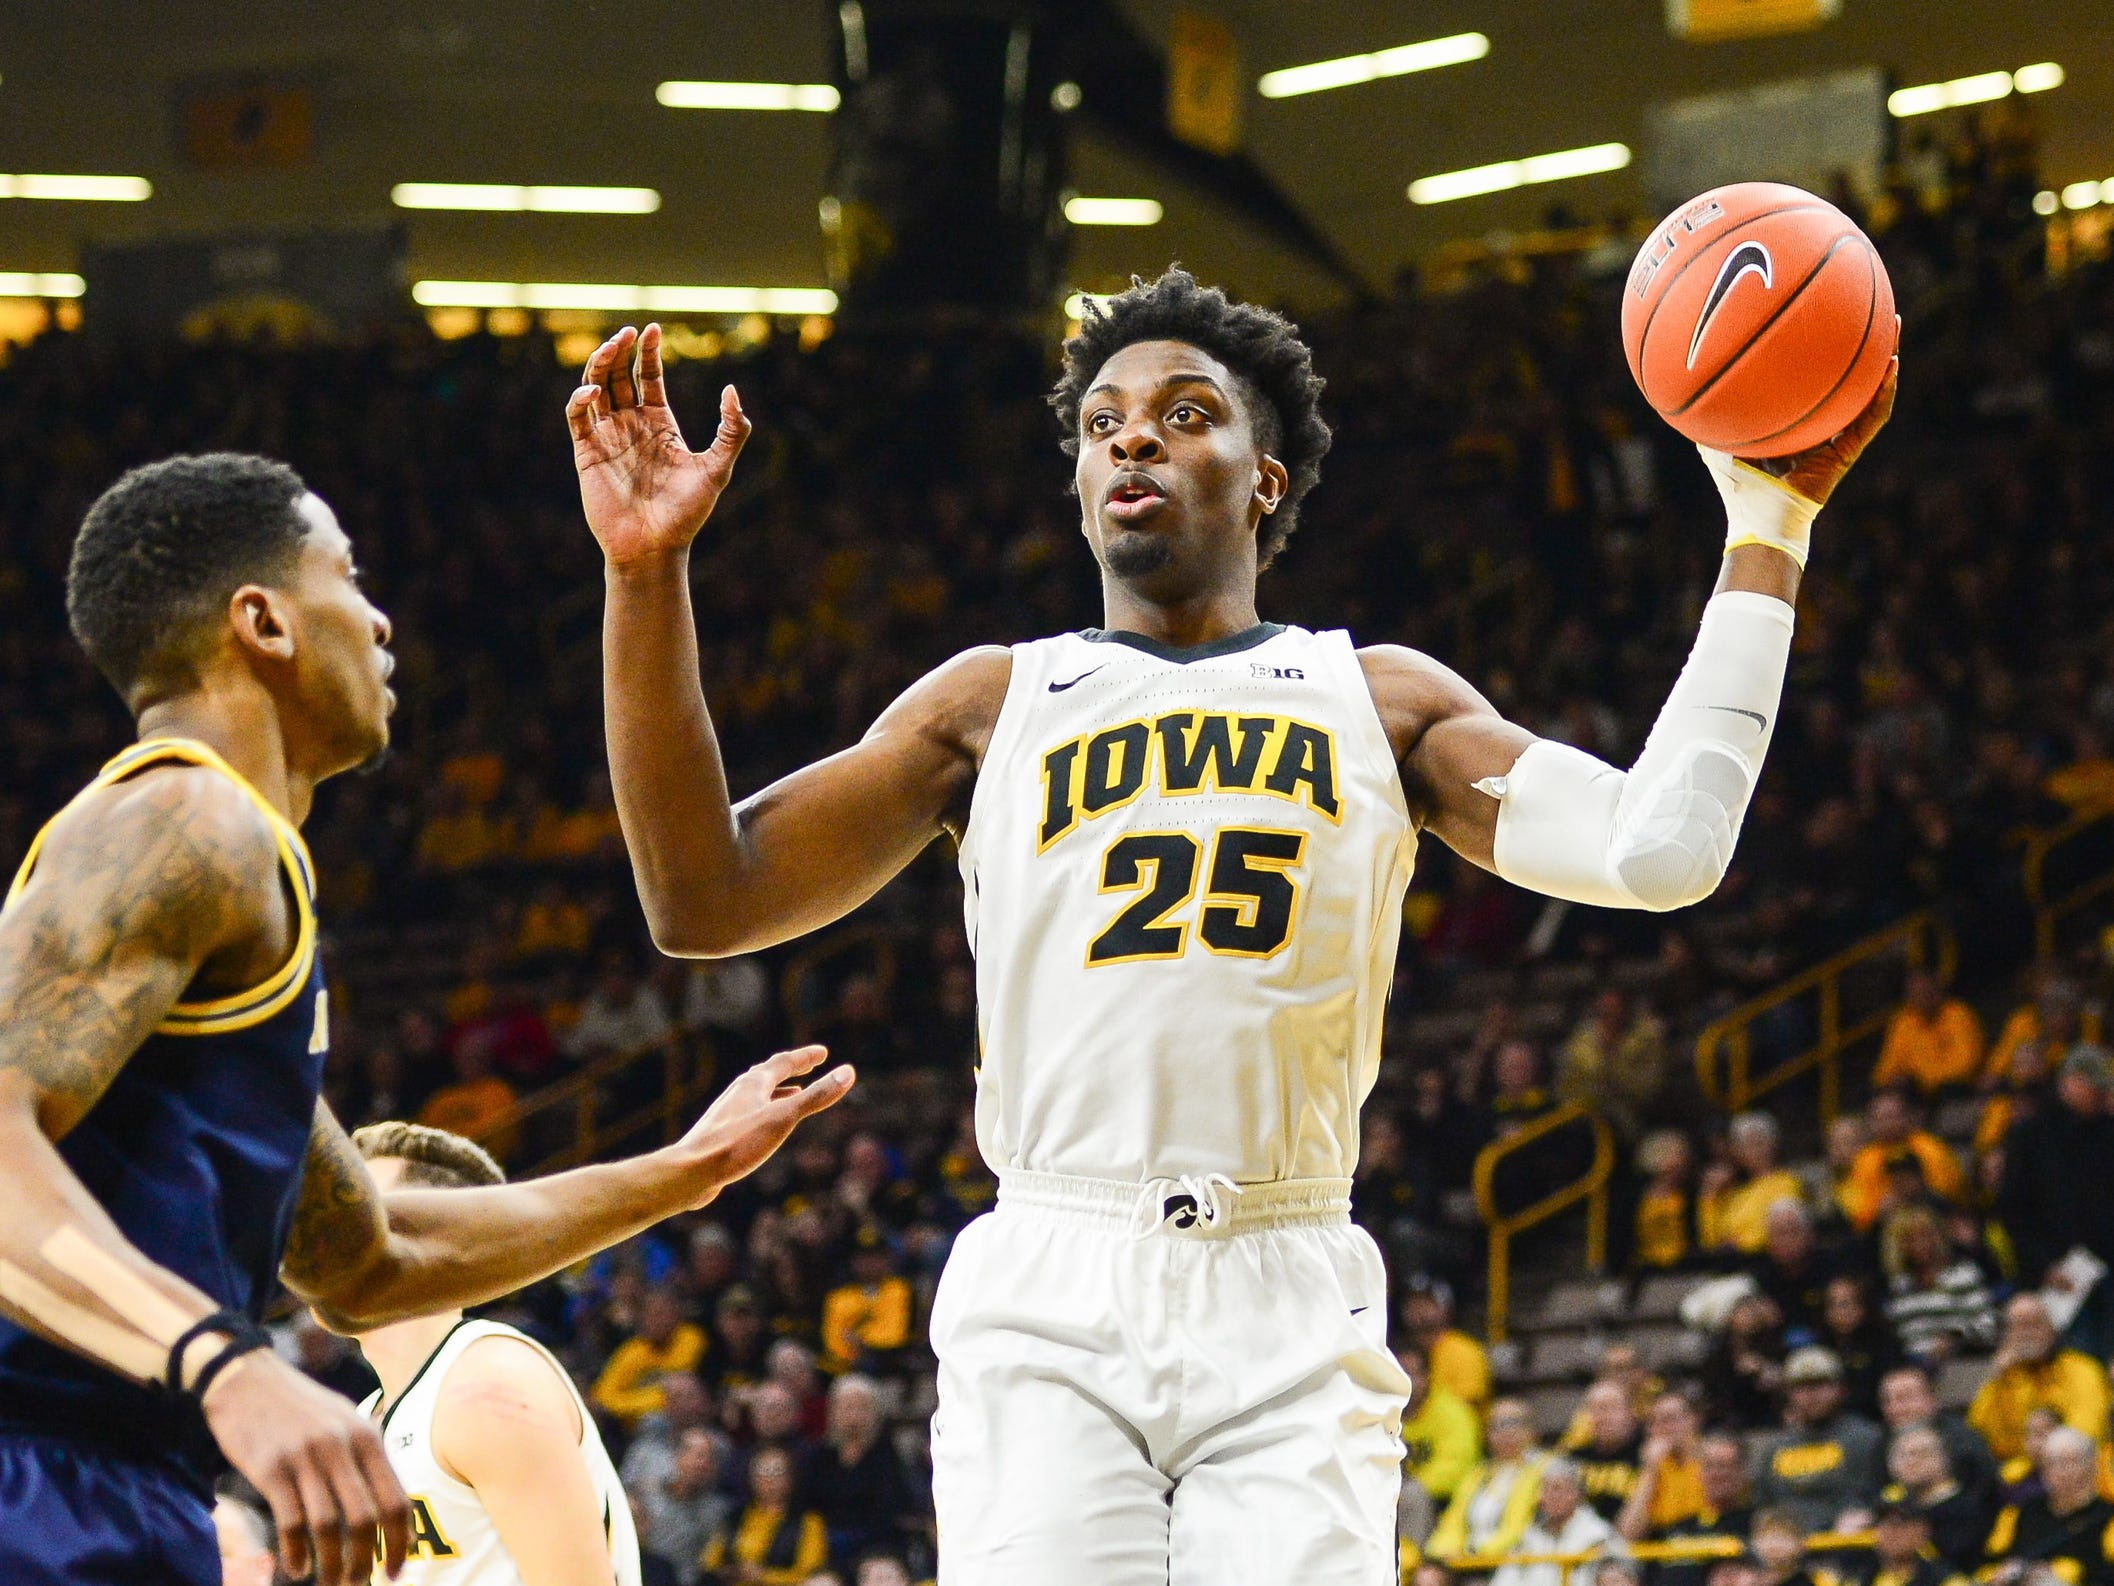 Iowa forward Tyler Cook controls the ball during the first half against Michigan, Feb. 1, 2019 in Iowa City, Iowa.